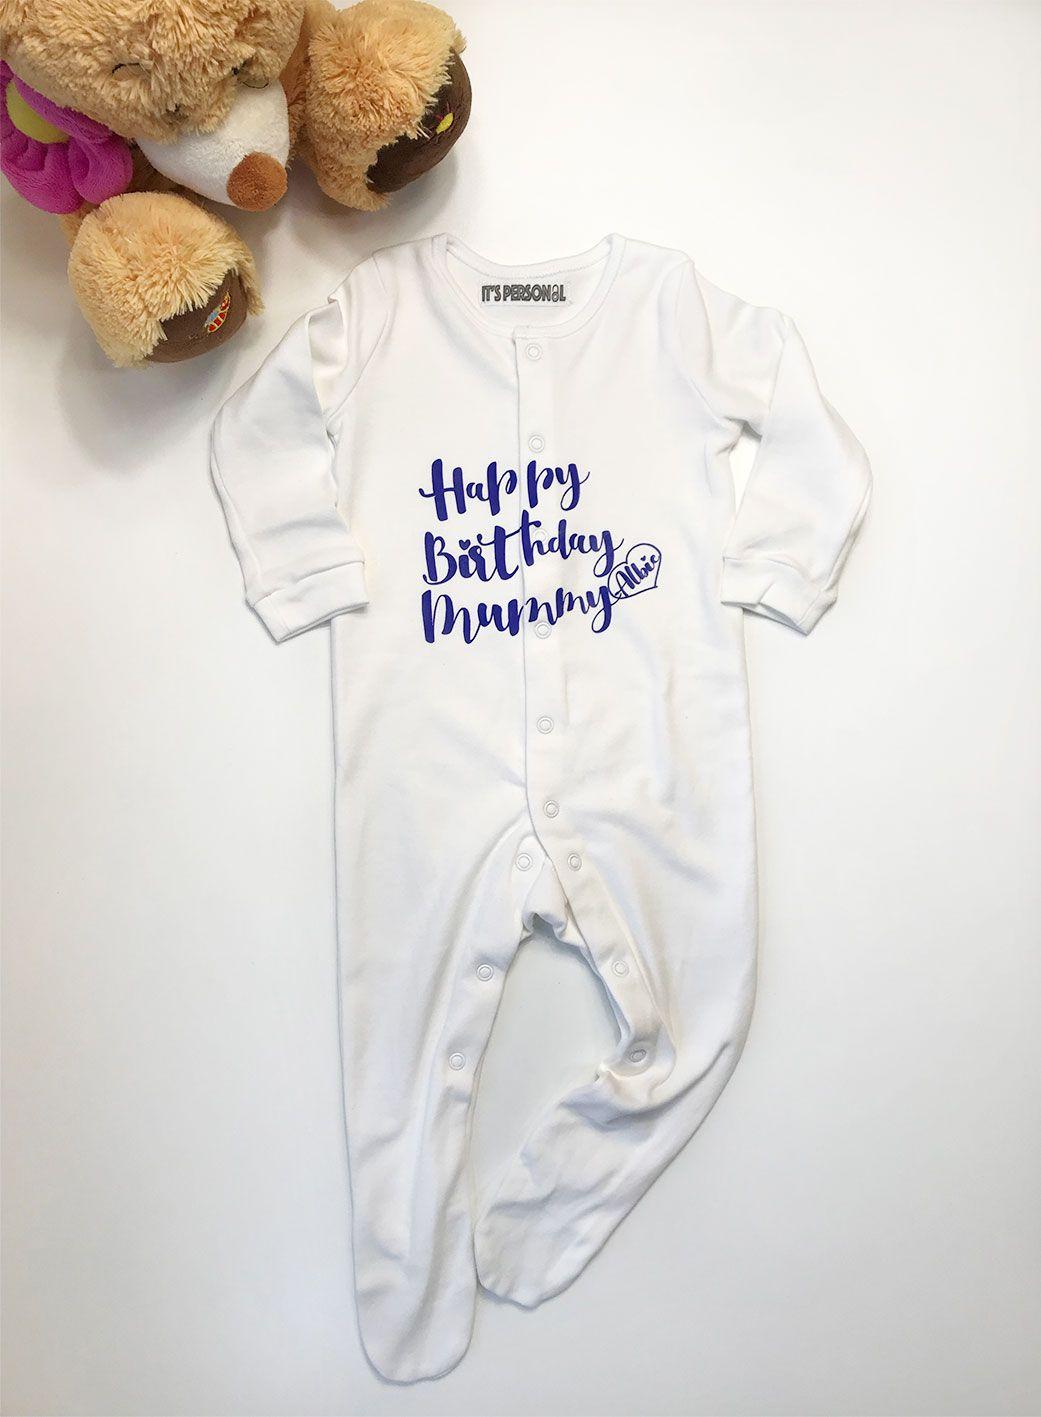 PERSONALISED  BABY VEST BABYGROW CLOTHING GROW SHOWER GIFTS BOY GIRL UNISEX